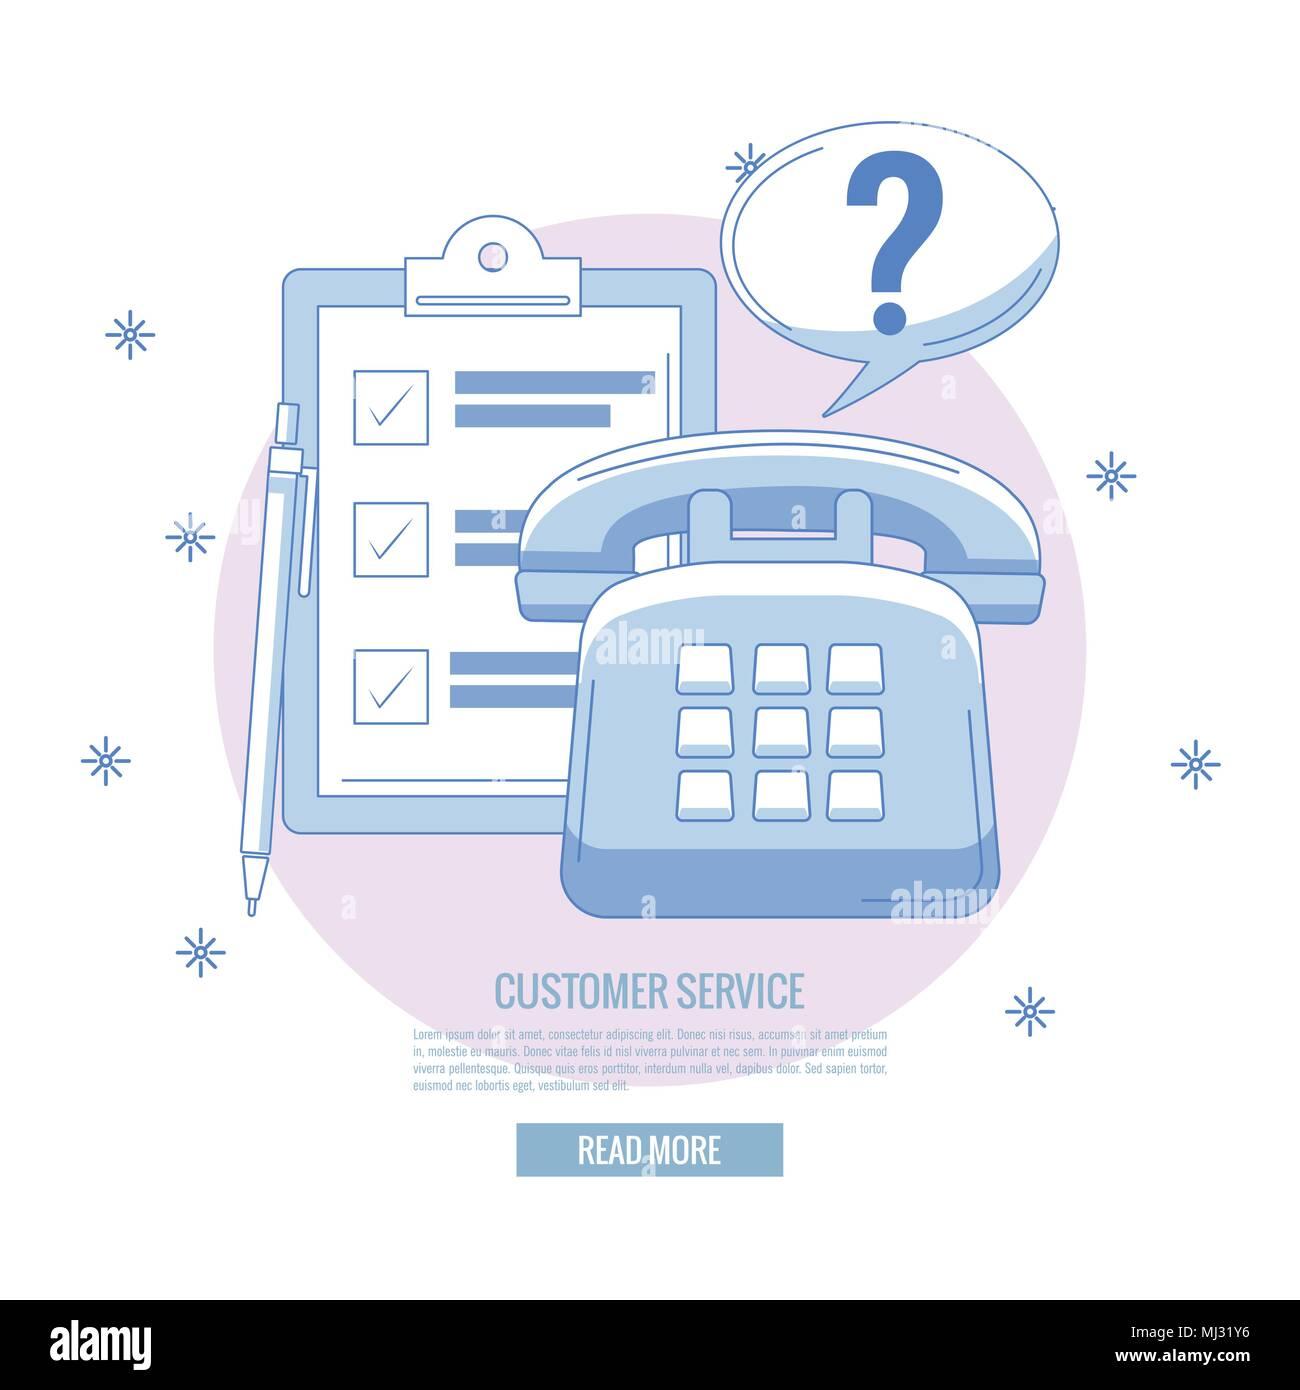 Customer service banner - Stock Image